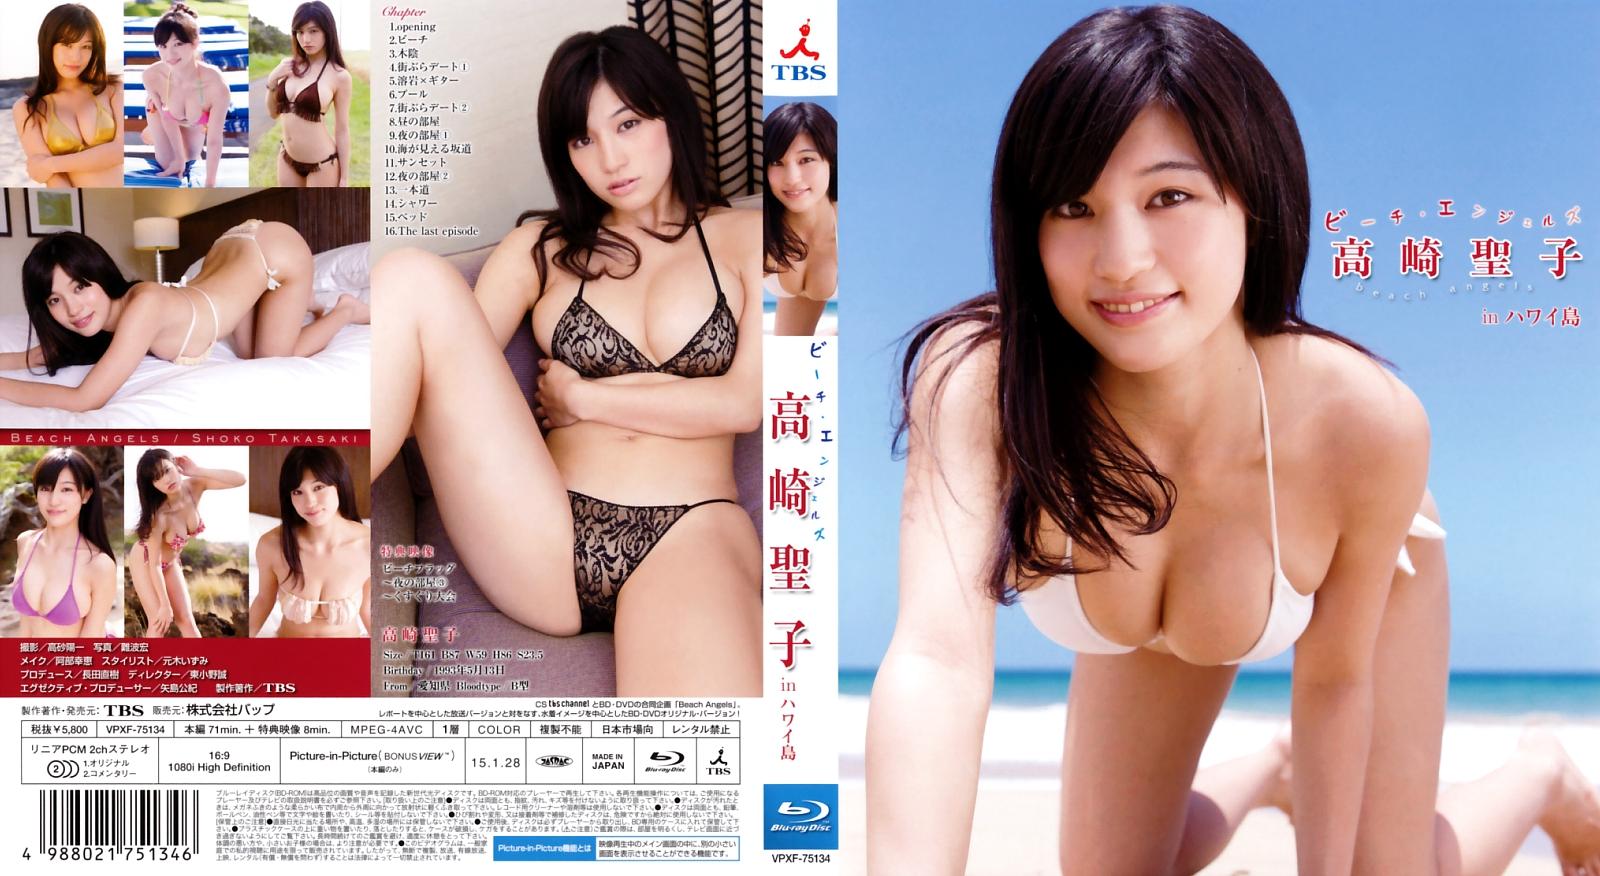 [VPXF-75134] Shoko Takasaki 高崎聖子 Beach Angels ビーチエンジェルズ 高崎聖子 in ハワイ島 Blu-ray